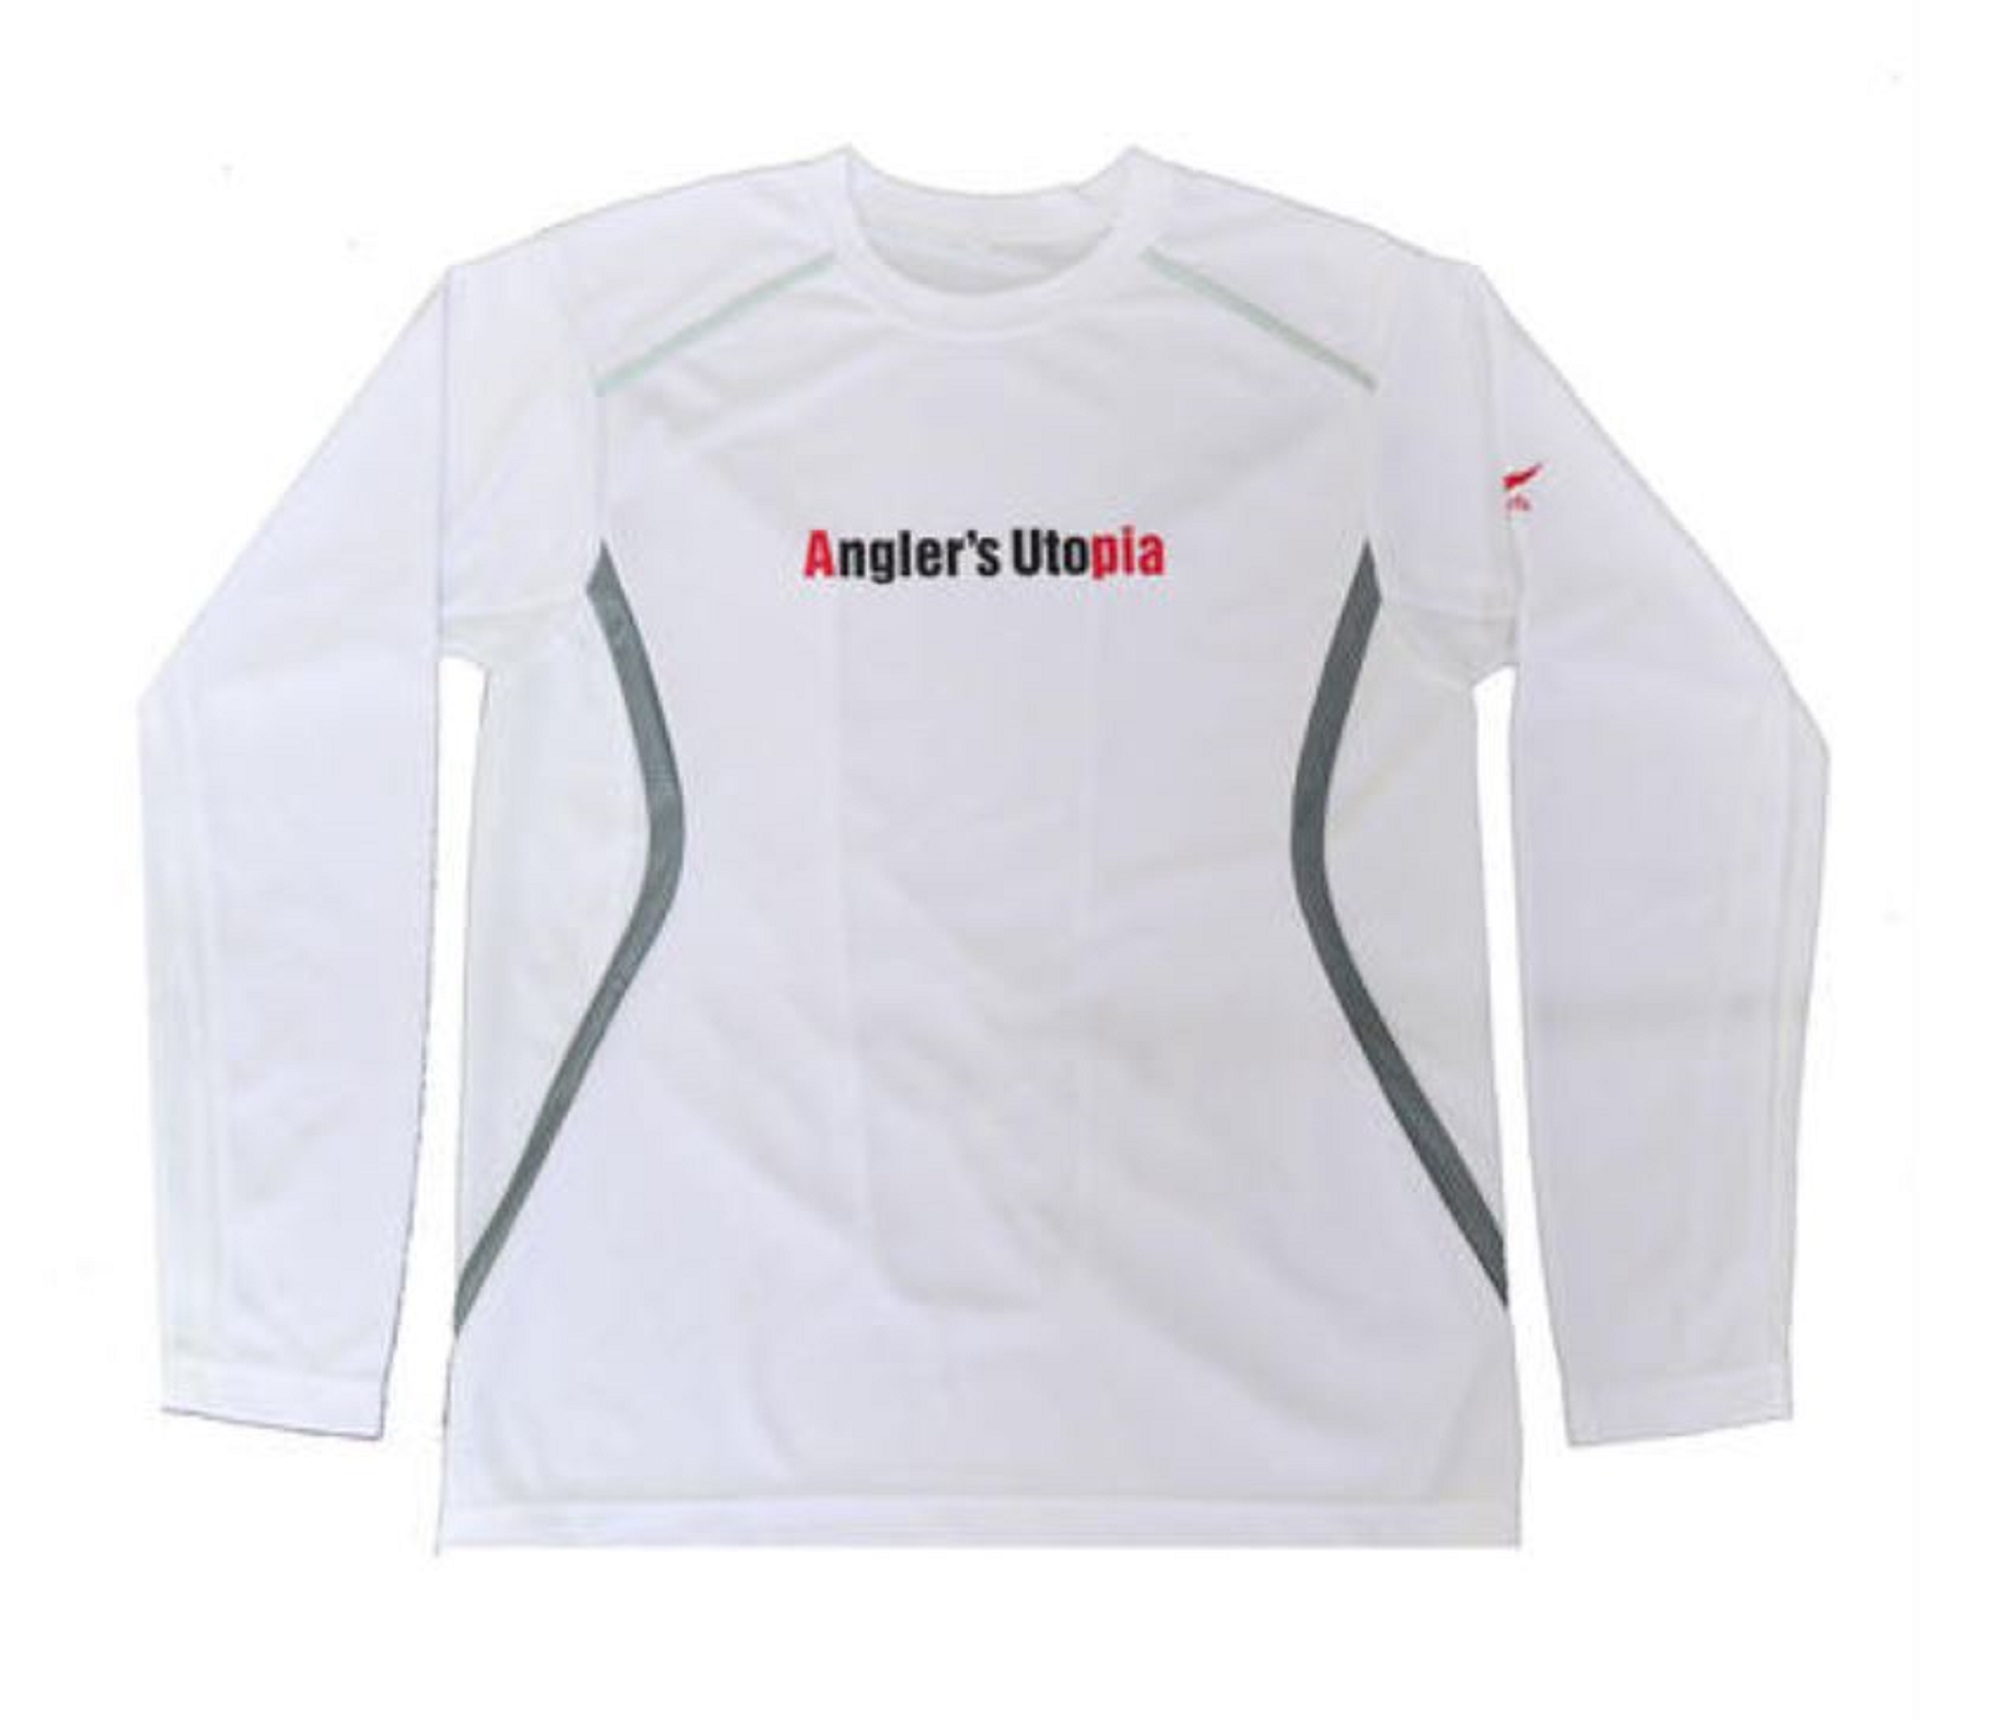 Apia T-Shirt Dry Long Sleeve Size L White (9846)